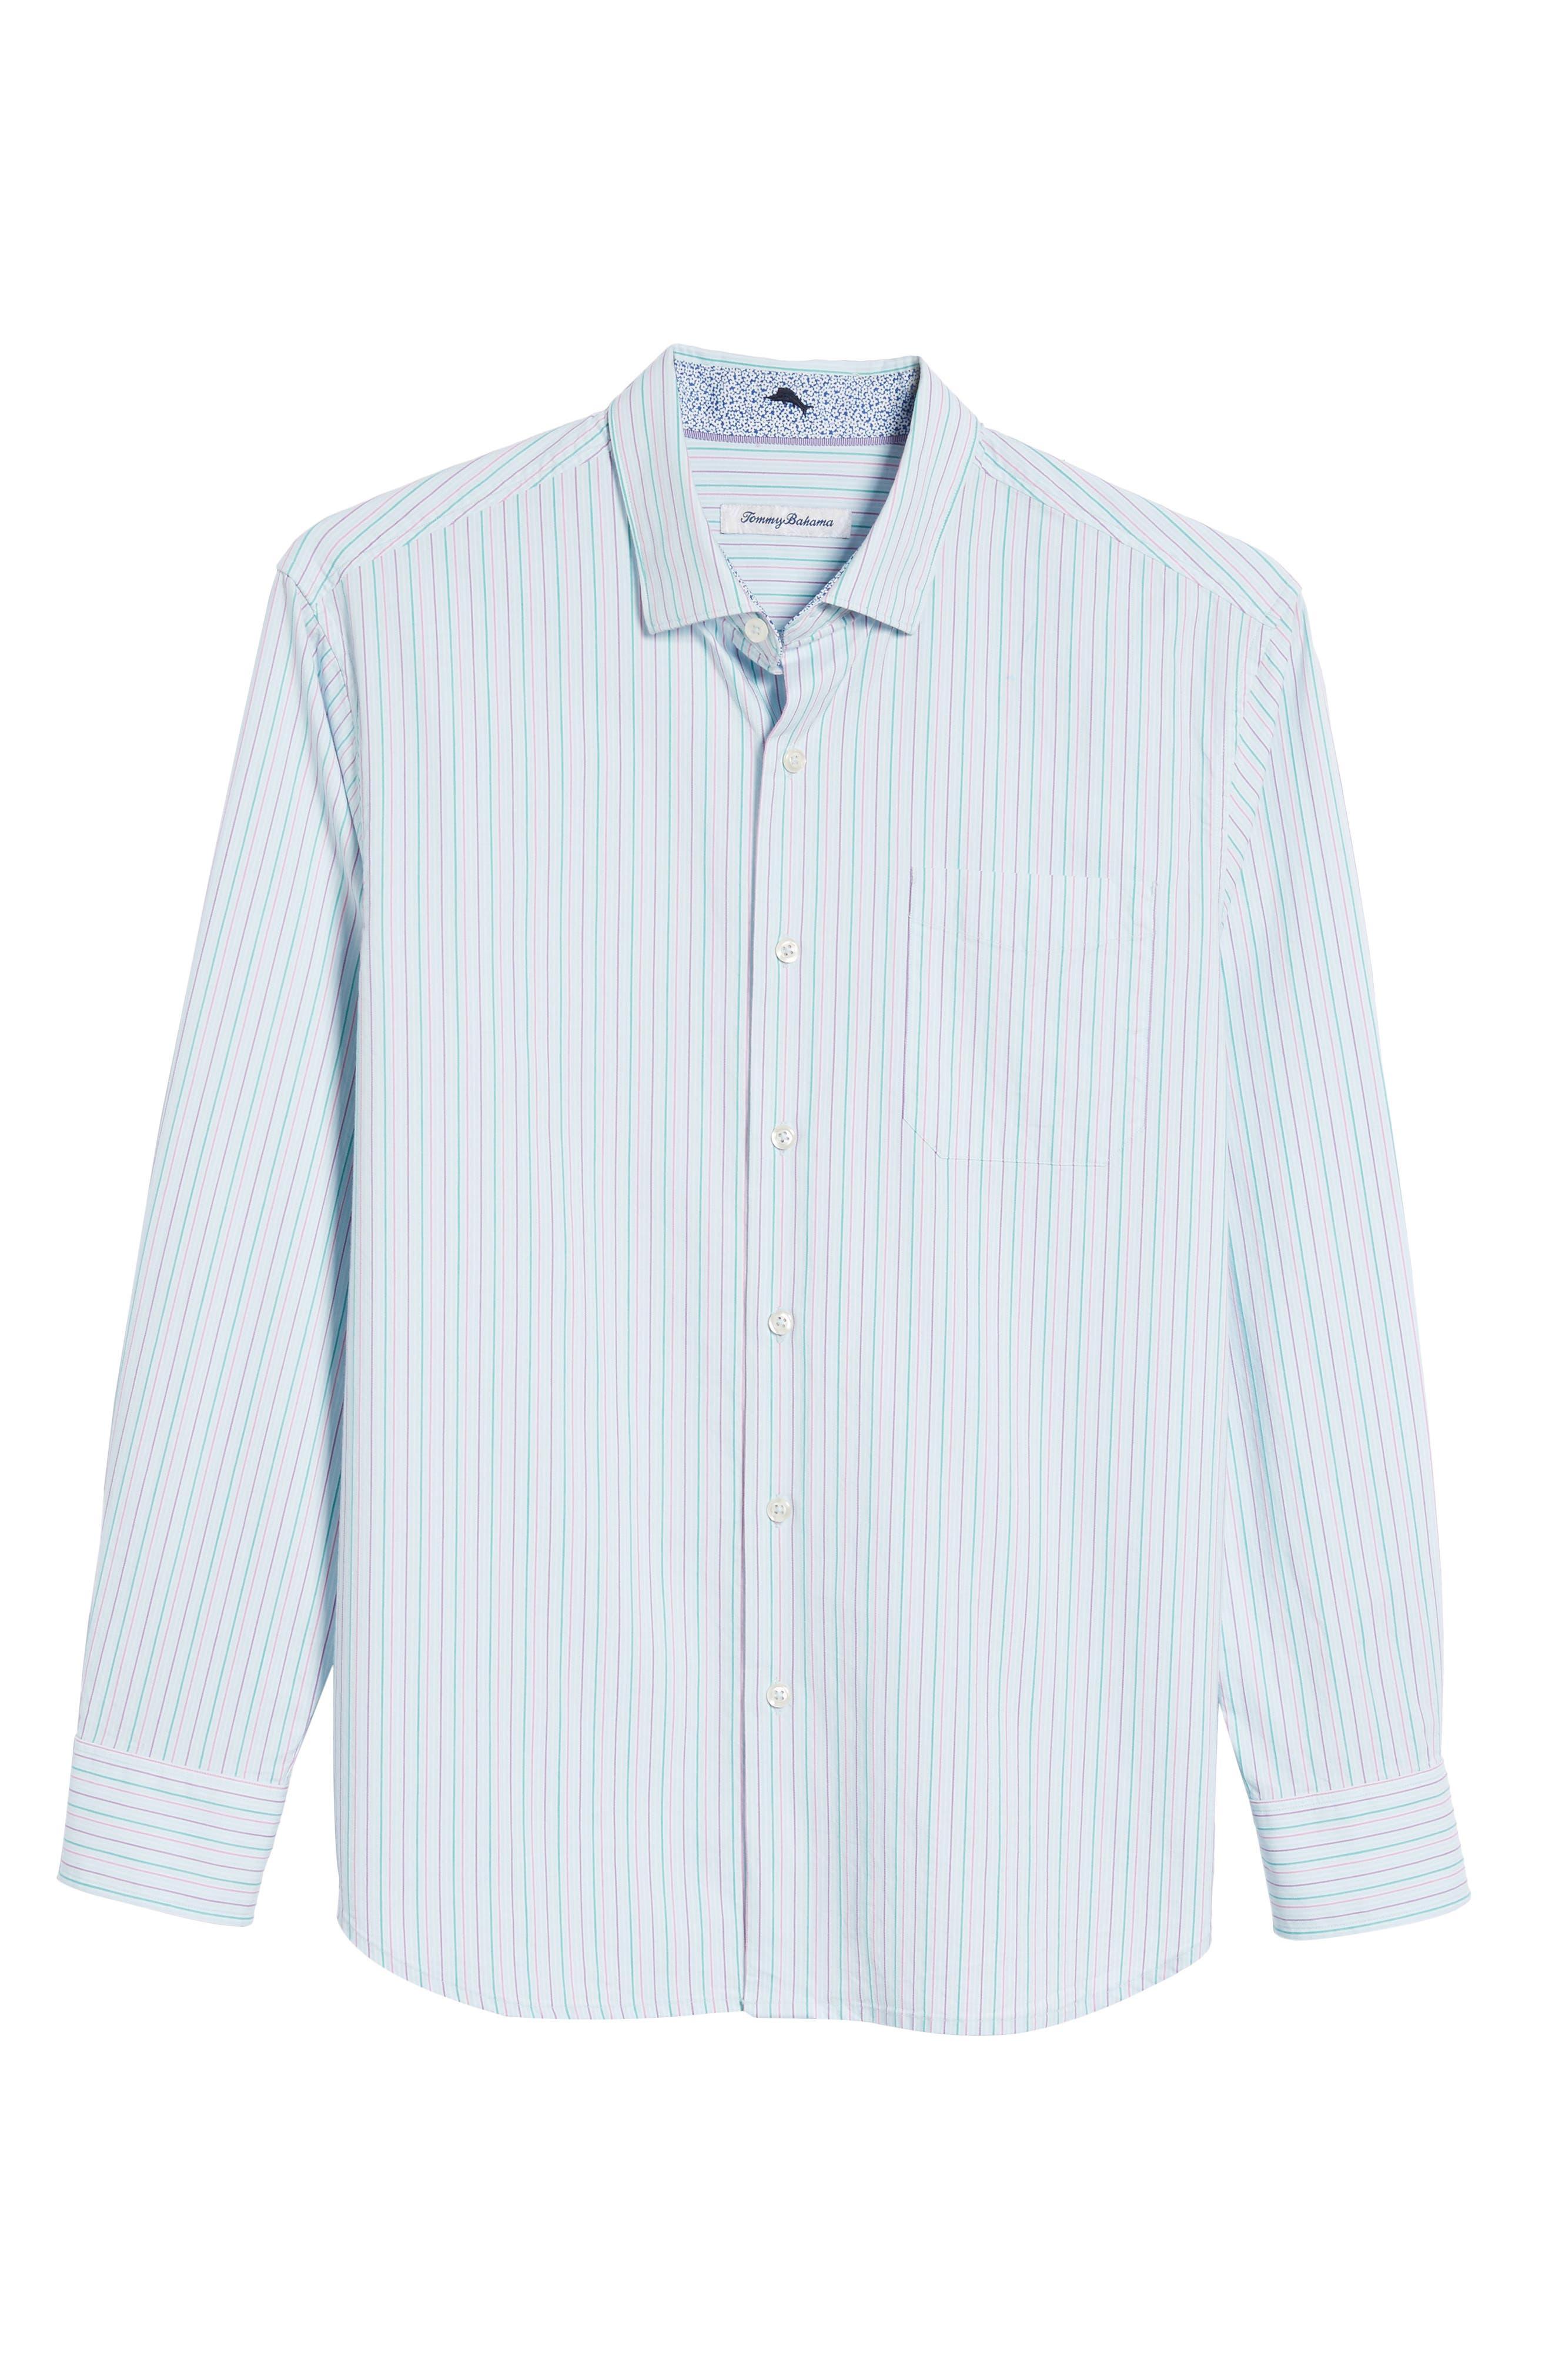 Tallahassee Cotton & Silk Blend Sport Shirt,                             Alternate thumbnail 6, color,                             400